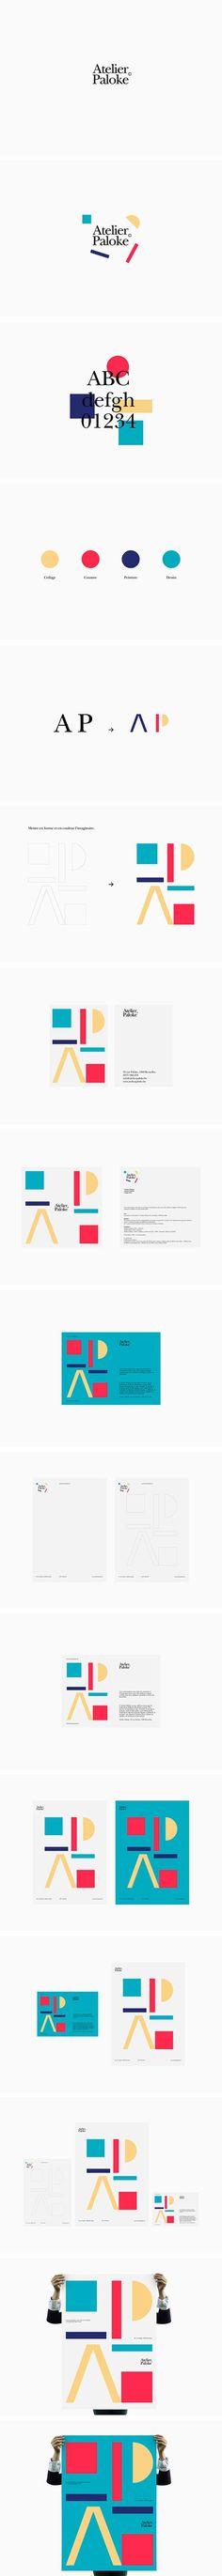 Atelier Paloke Branding by Dimitris Kostinis | Fivestar Branding – Design and Branding Agency & Inspiration Gallery